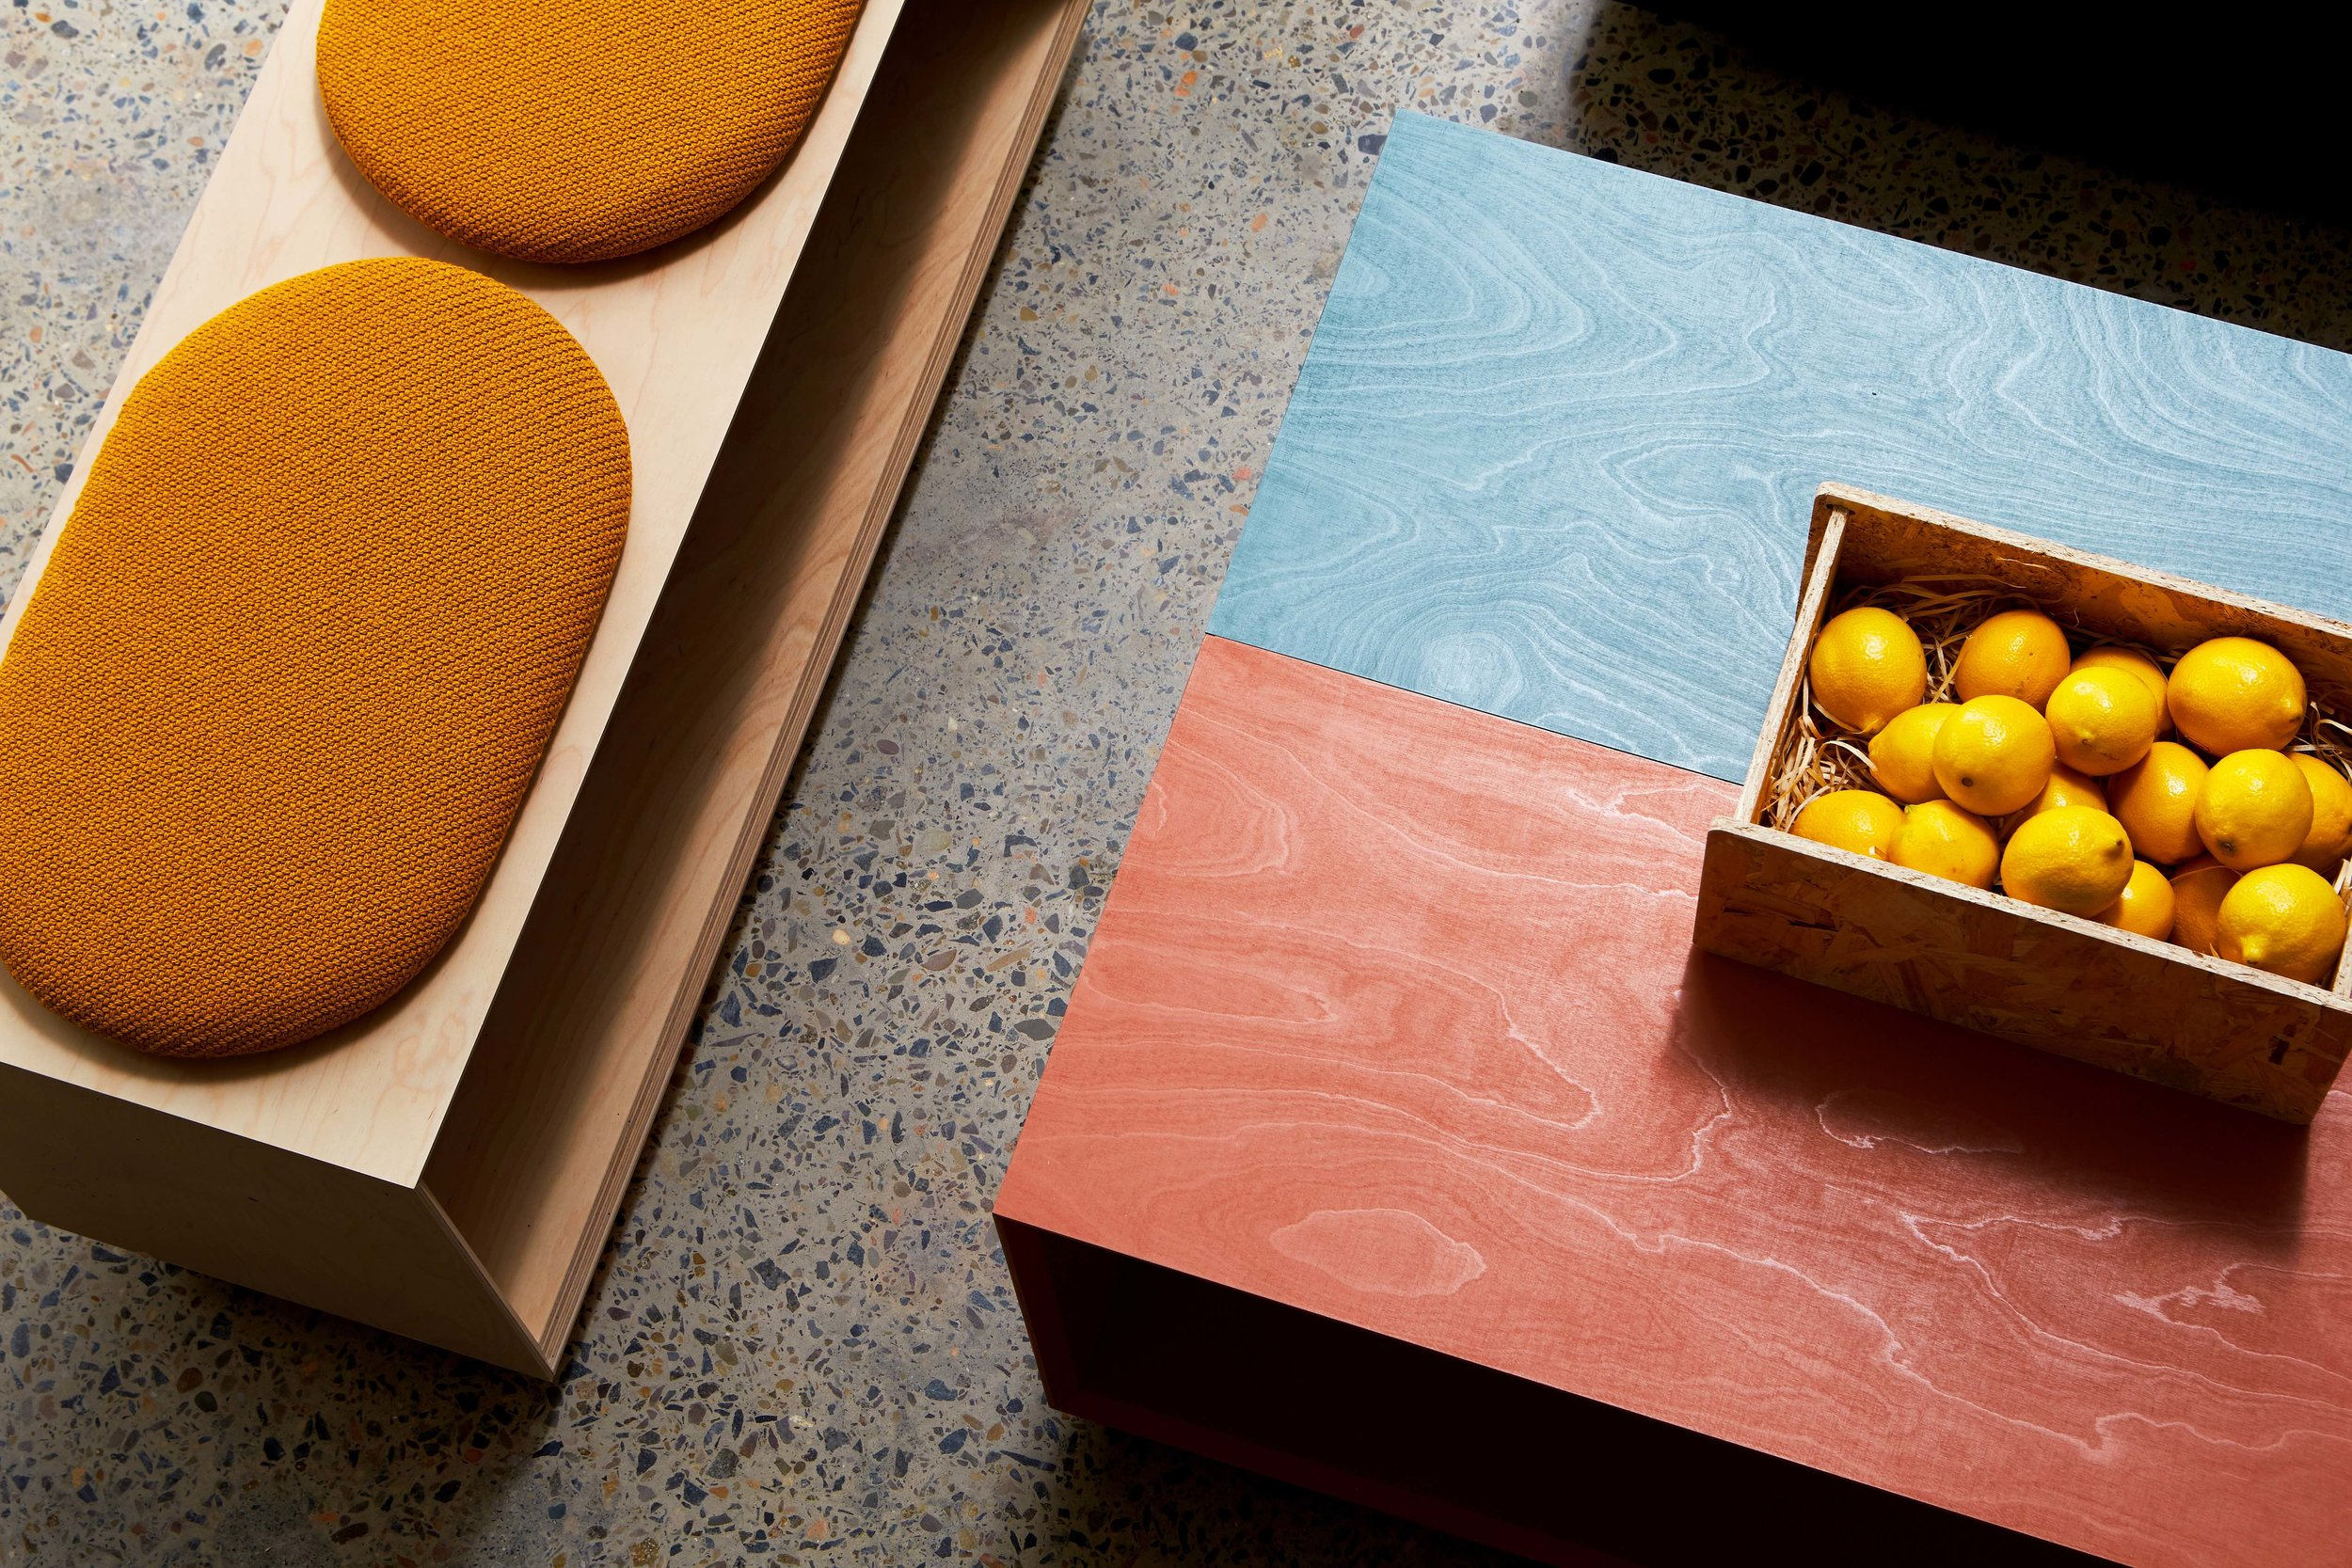 SoWatt-Loft-Plywood-OSBb-Bench-Seat-Table-Raw-05.jpg